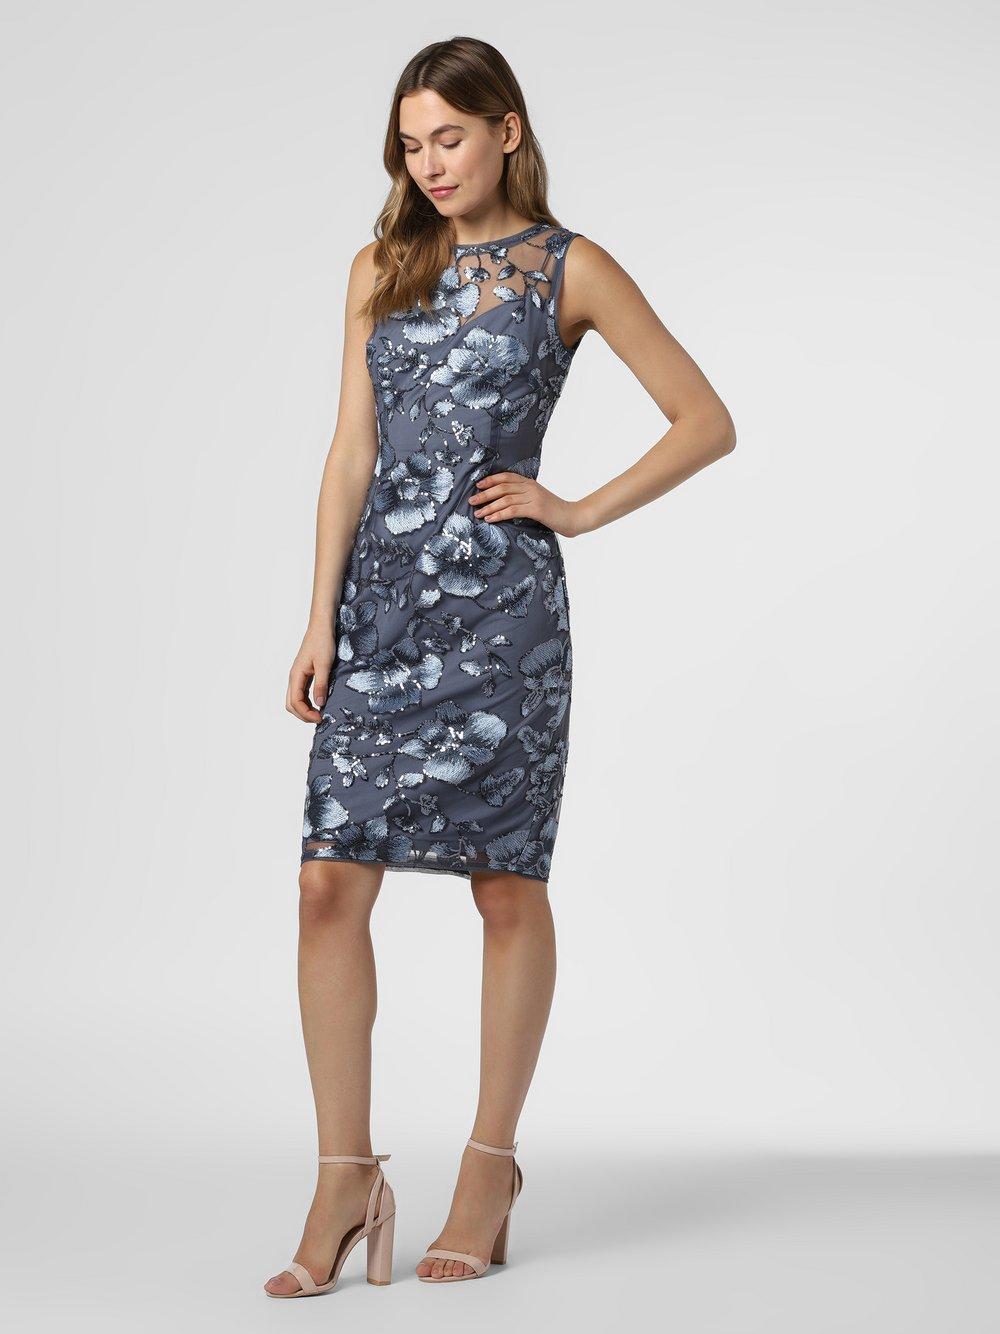 Adrianna Papell – Sukienka damska, niebieski Van Graaf 466189-0001